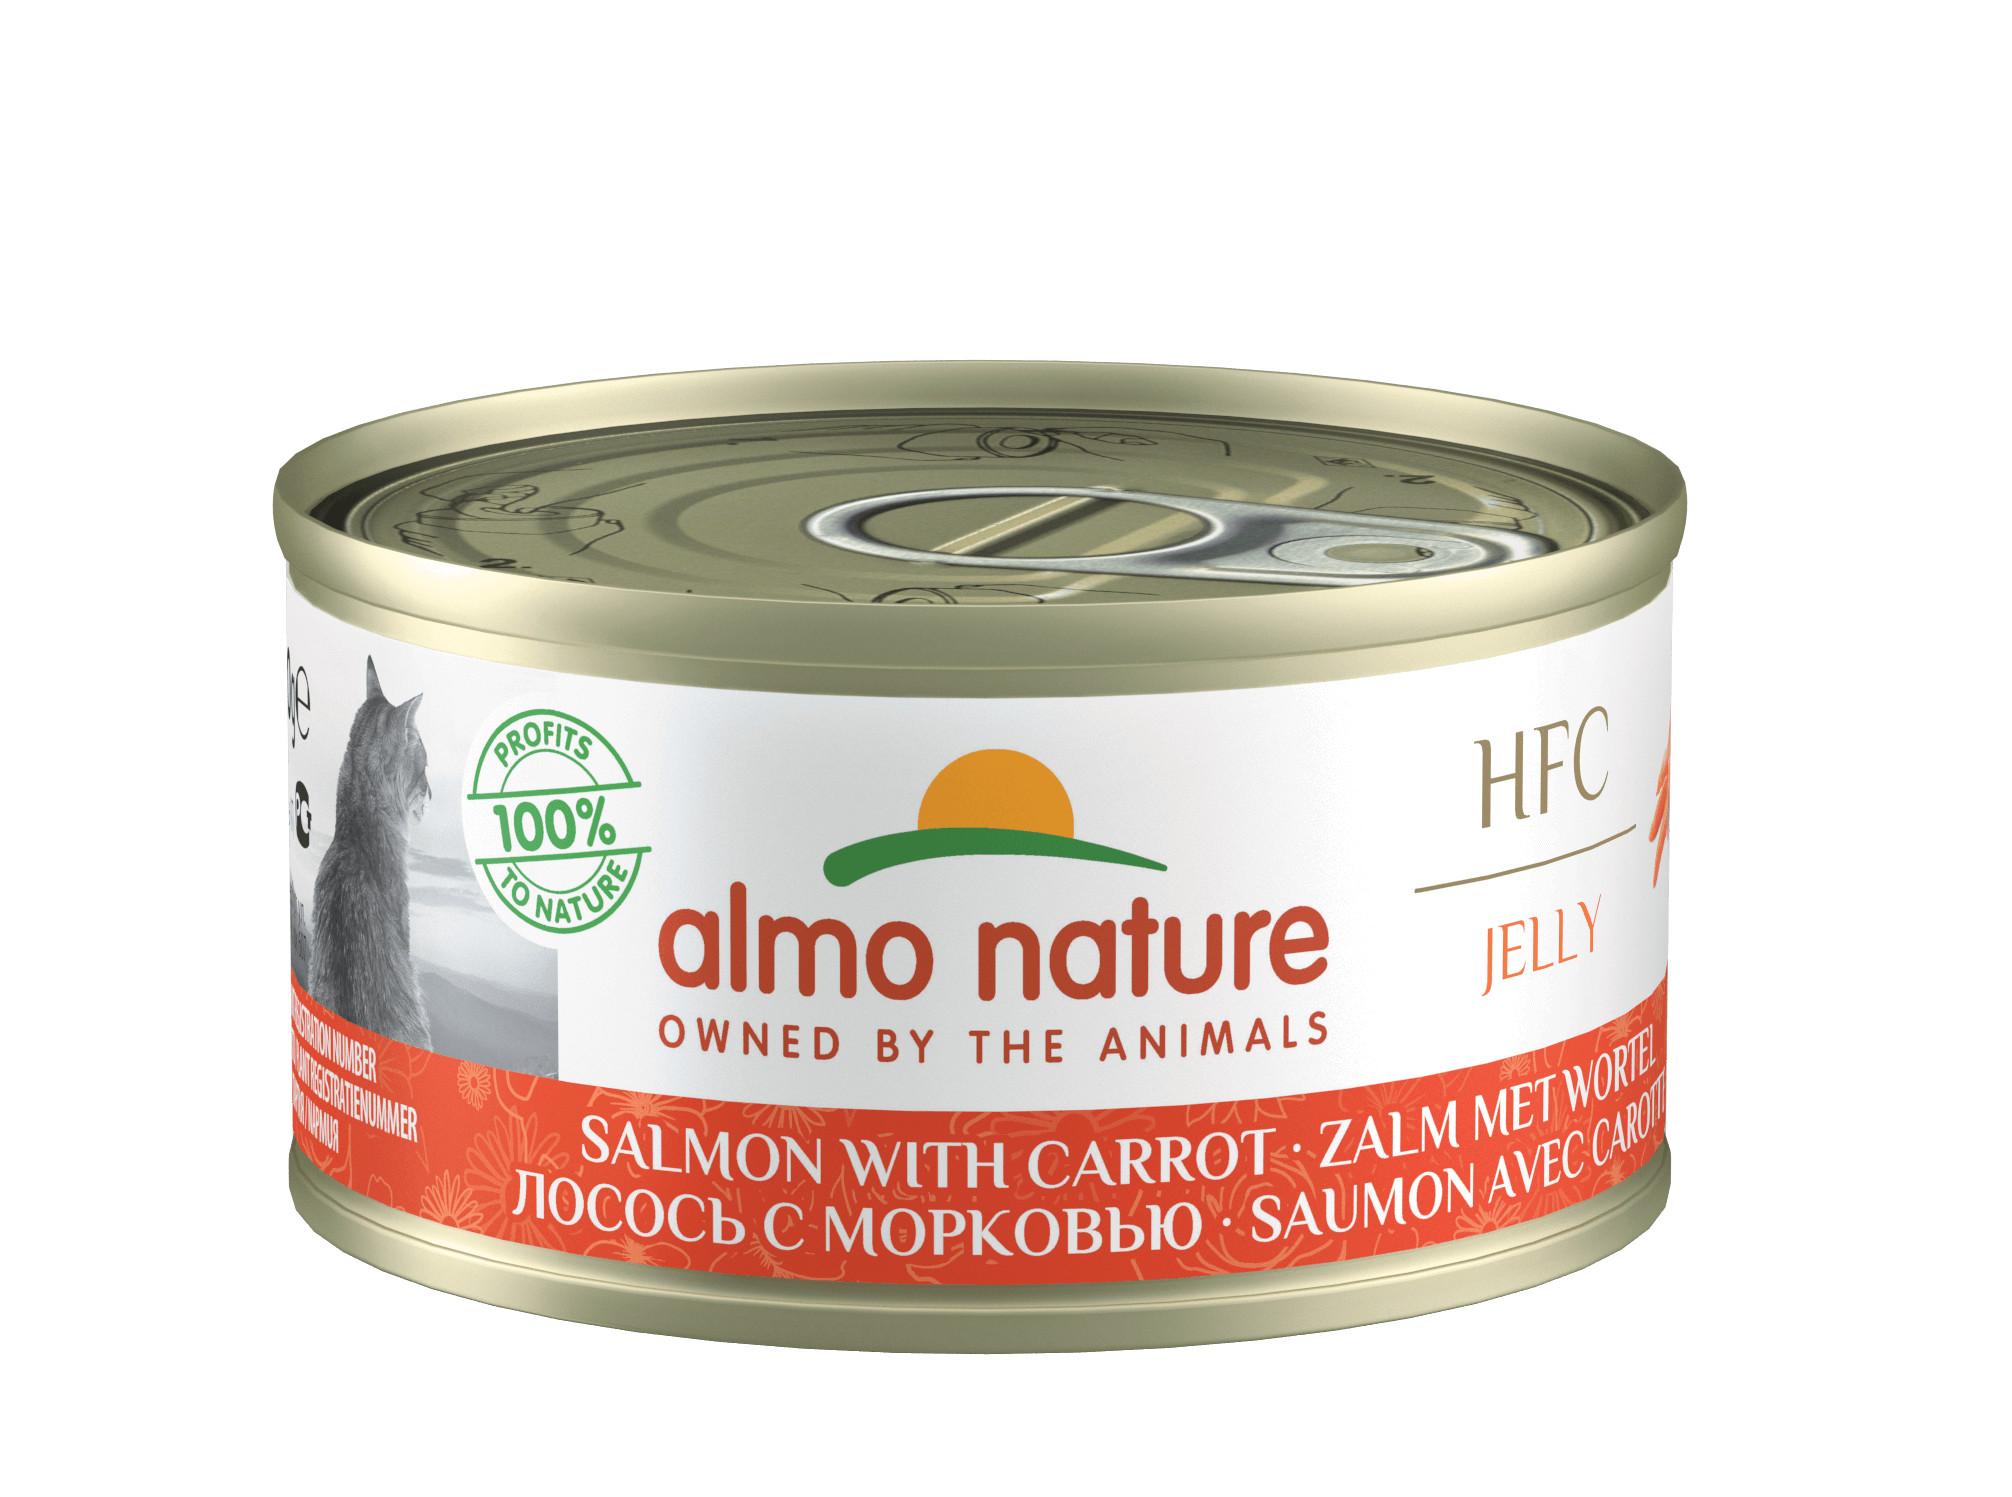 Almo Nature HFC Jelly Lachs mit Karotten Katzenfutter